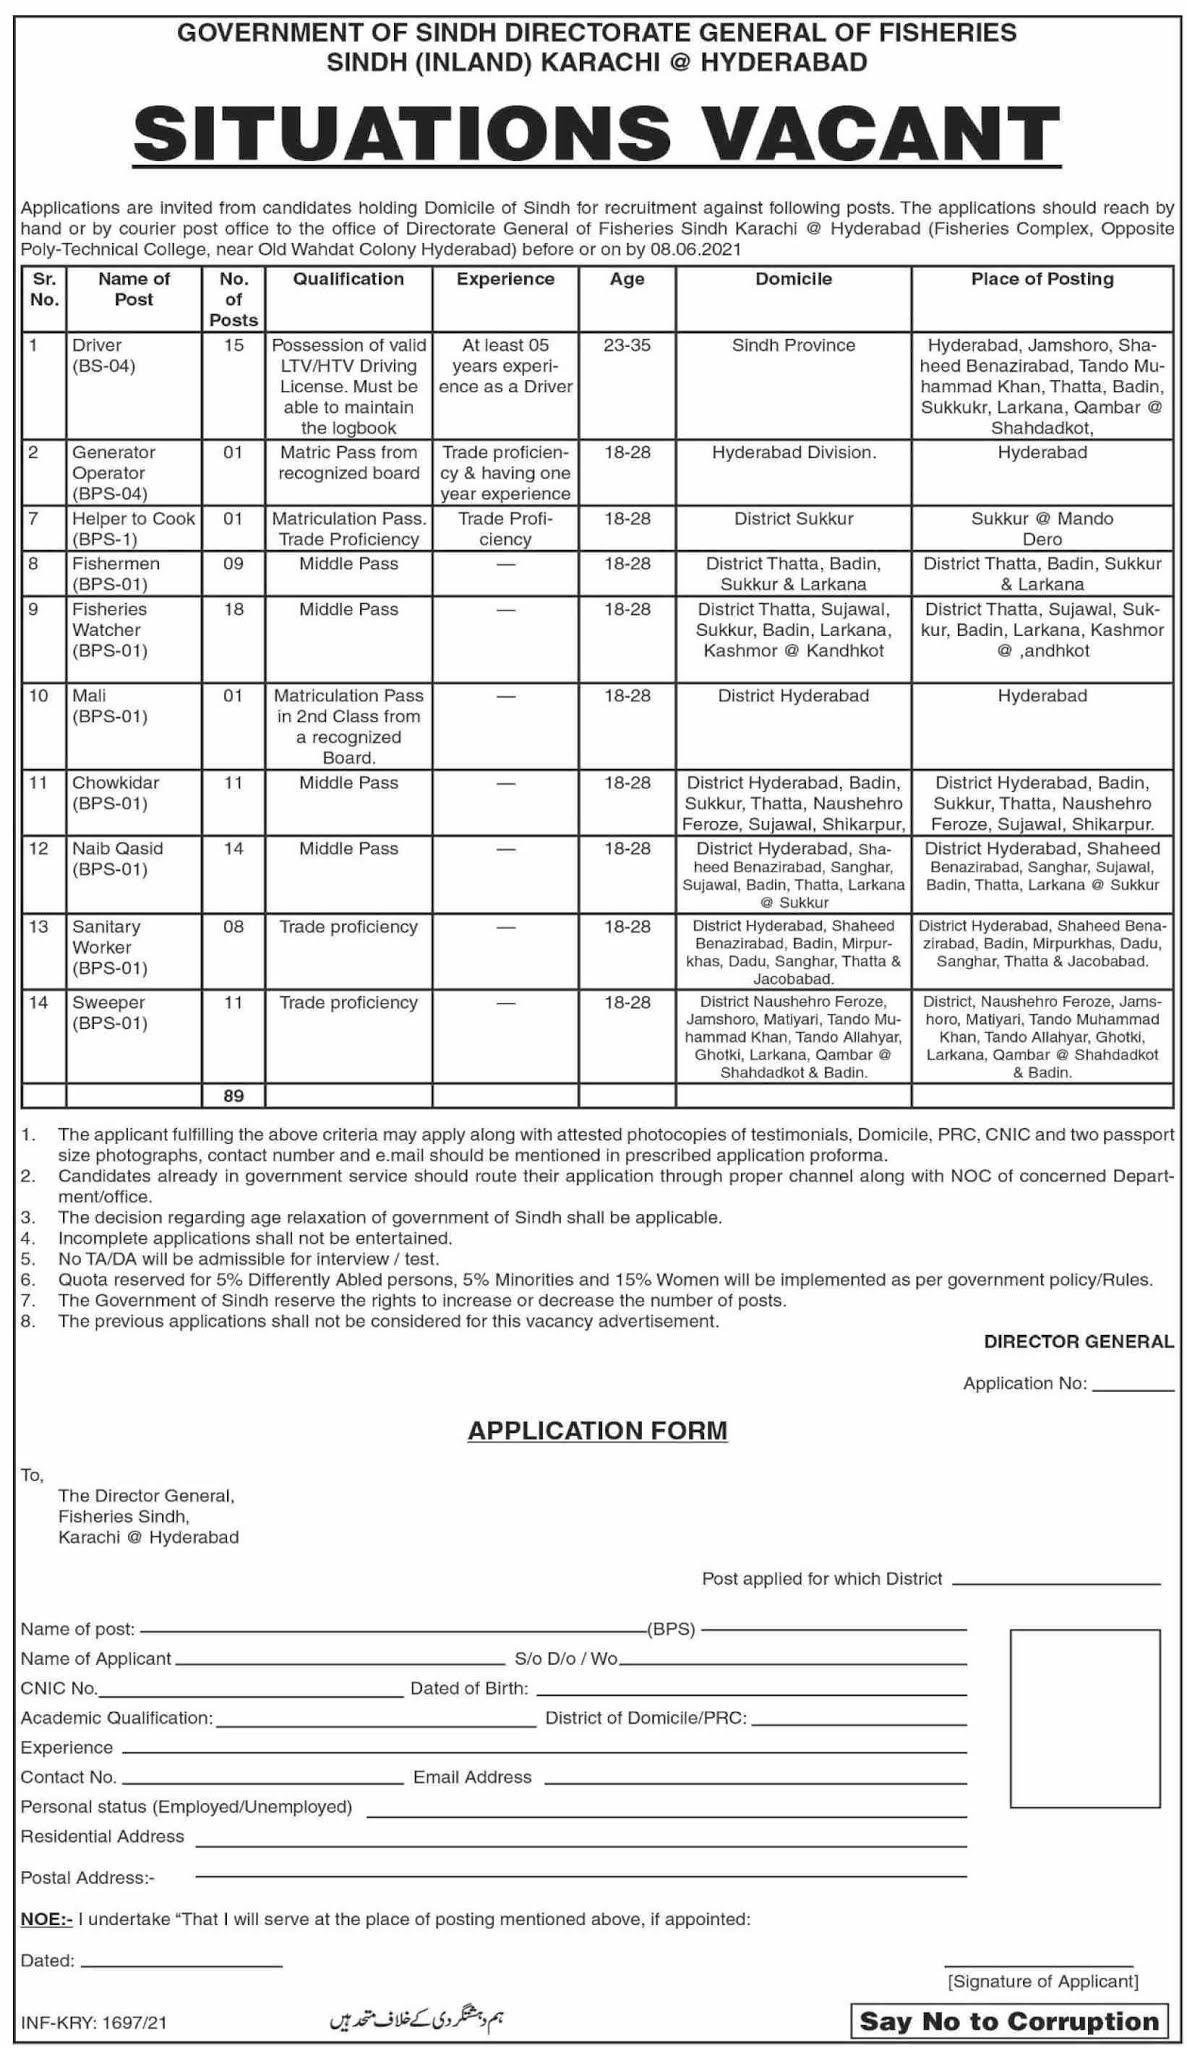 Directorate General Fisheries Sindh (Inland) Jobs 2021 in PakistanDirectorate General Fisheries Sindh (Inland) Jobs 2021 in Pakistan